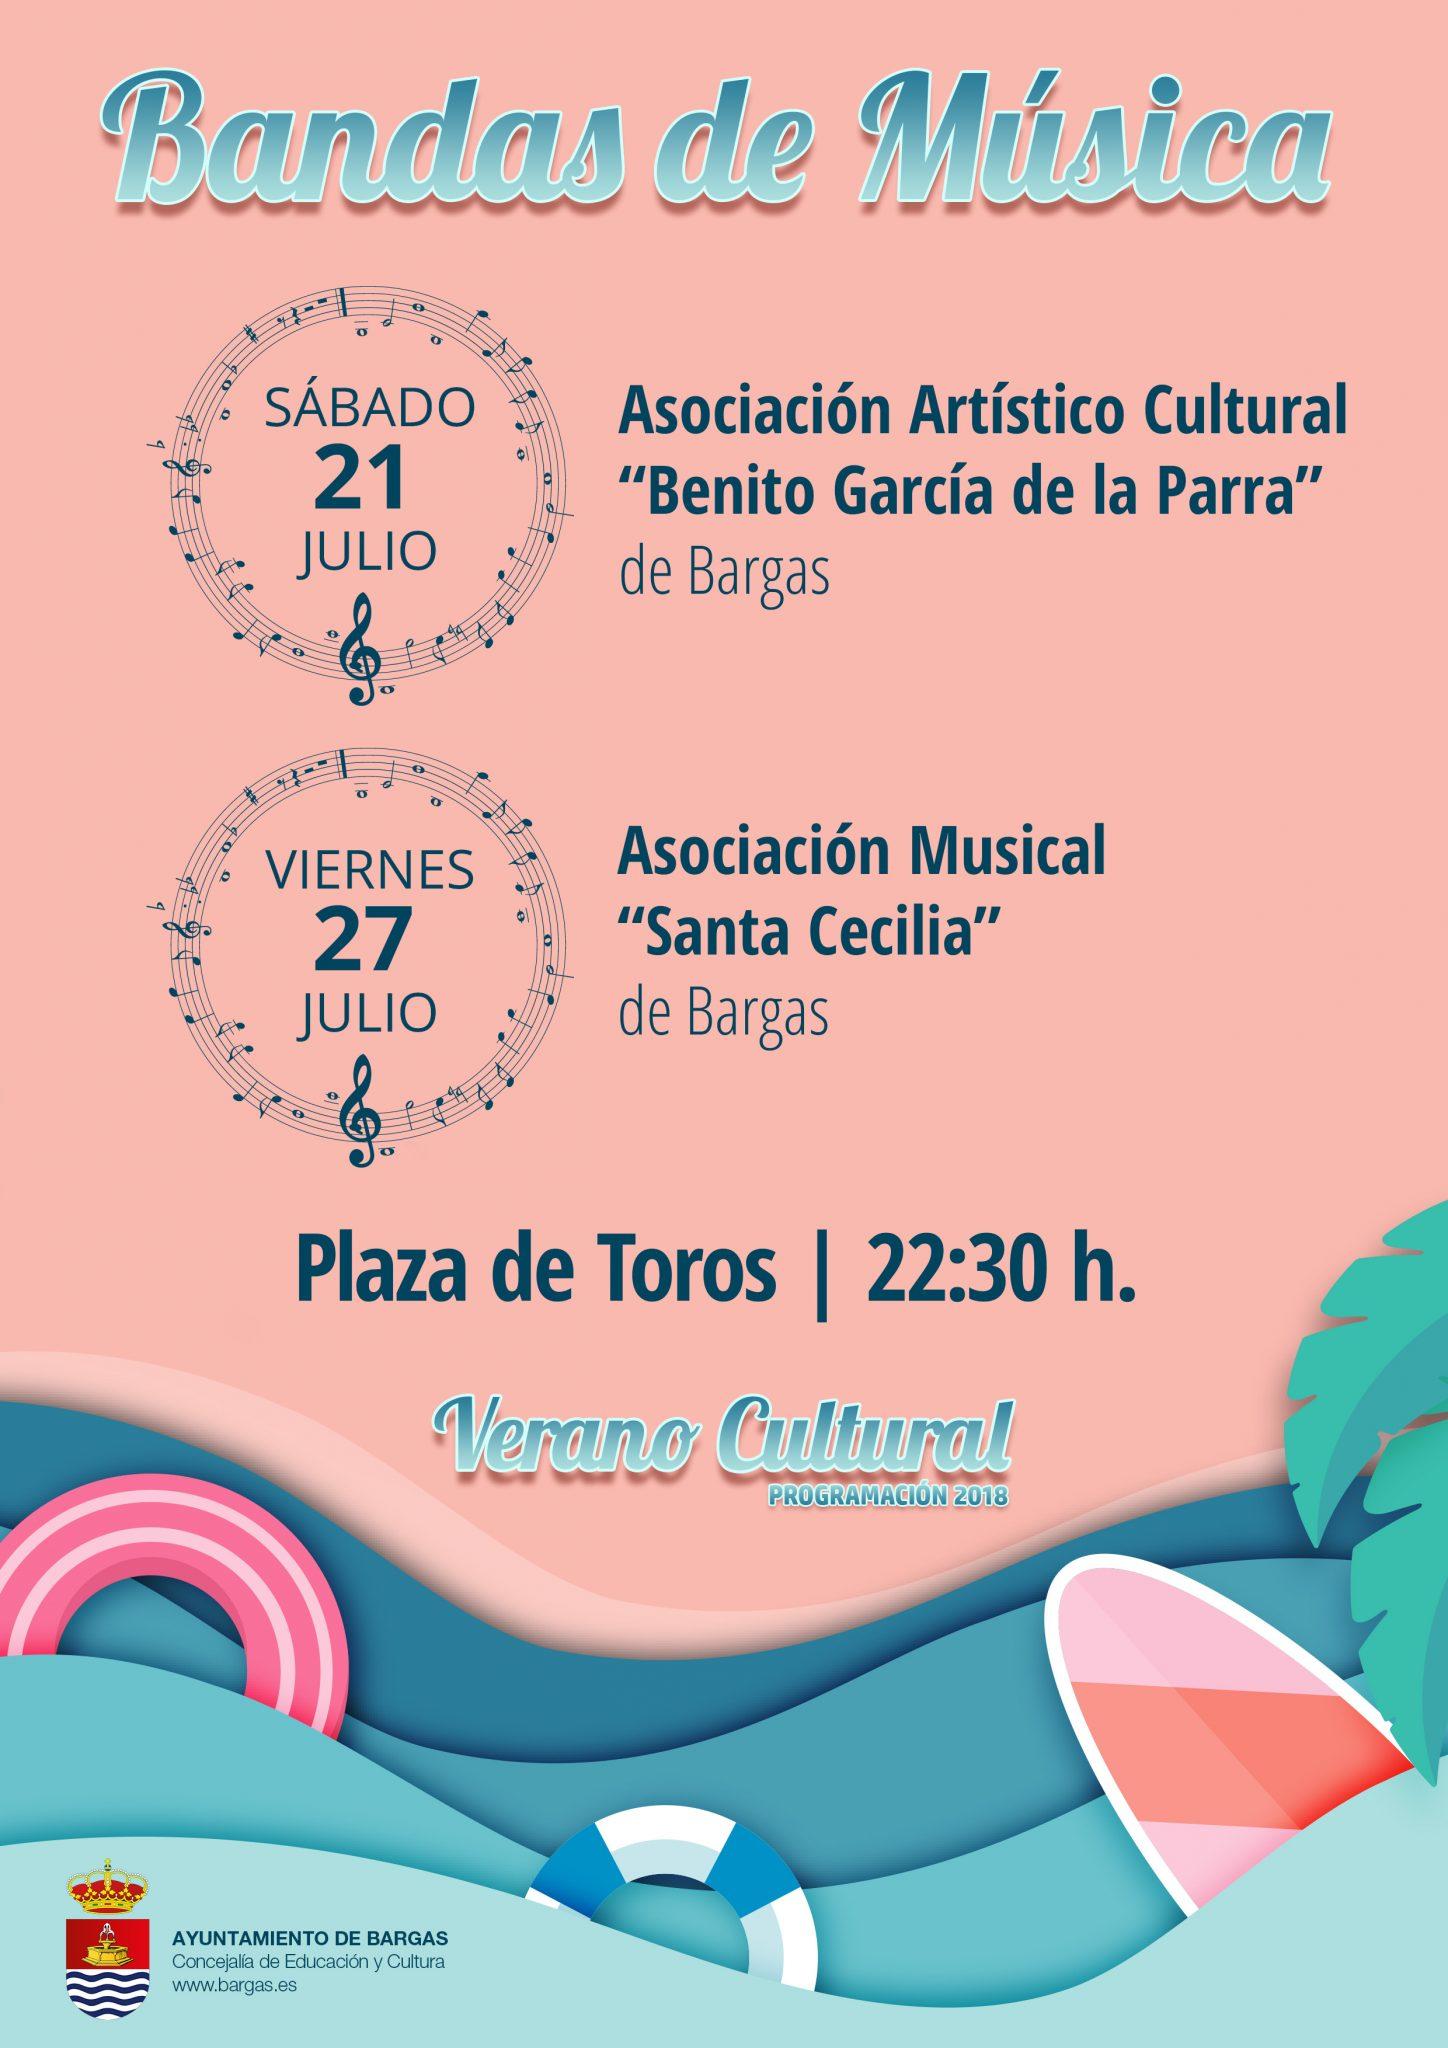 Bandas de Música – Verano Cultural 2018